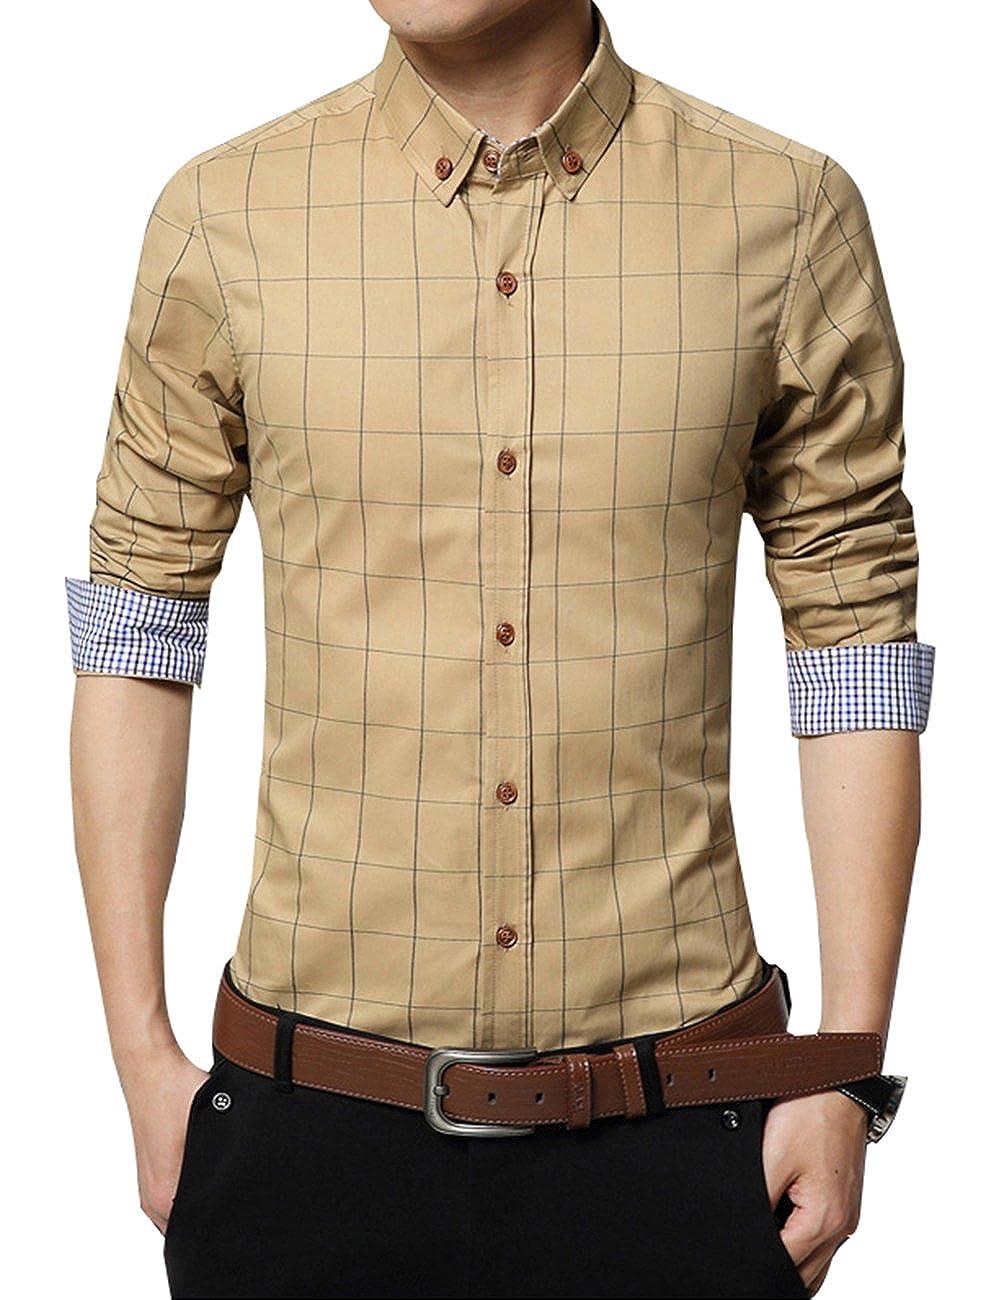 ERZTIAY Mens Formal Business Plaid Slim Fit Long Sleeve Dress Shirts